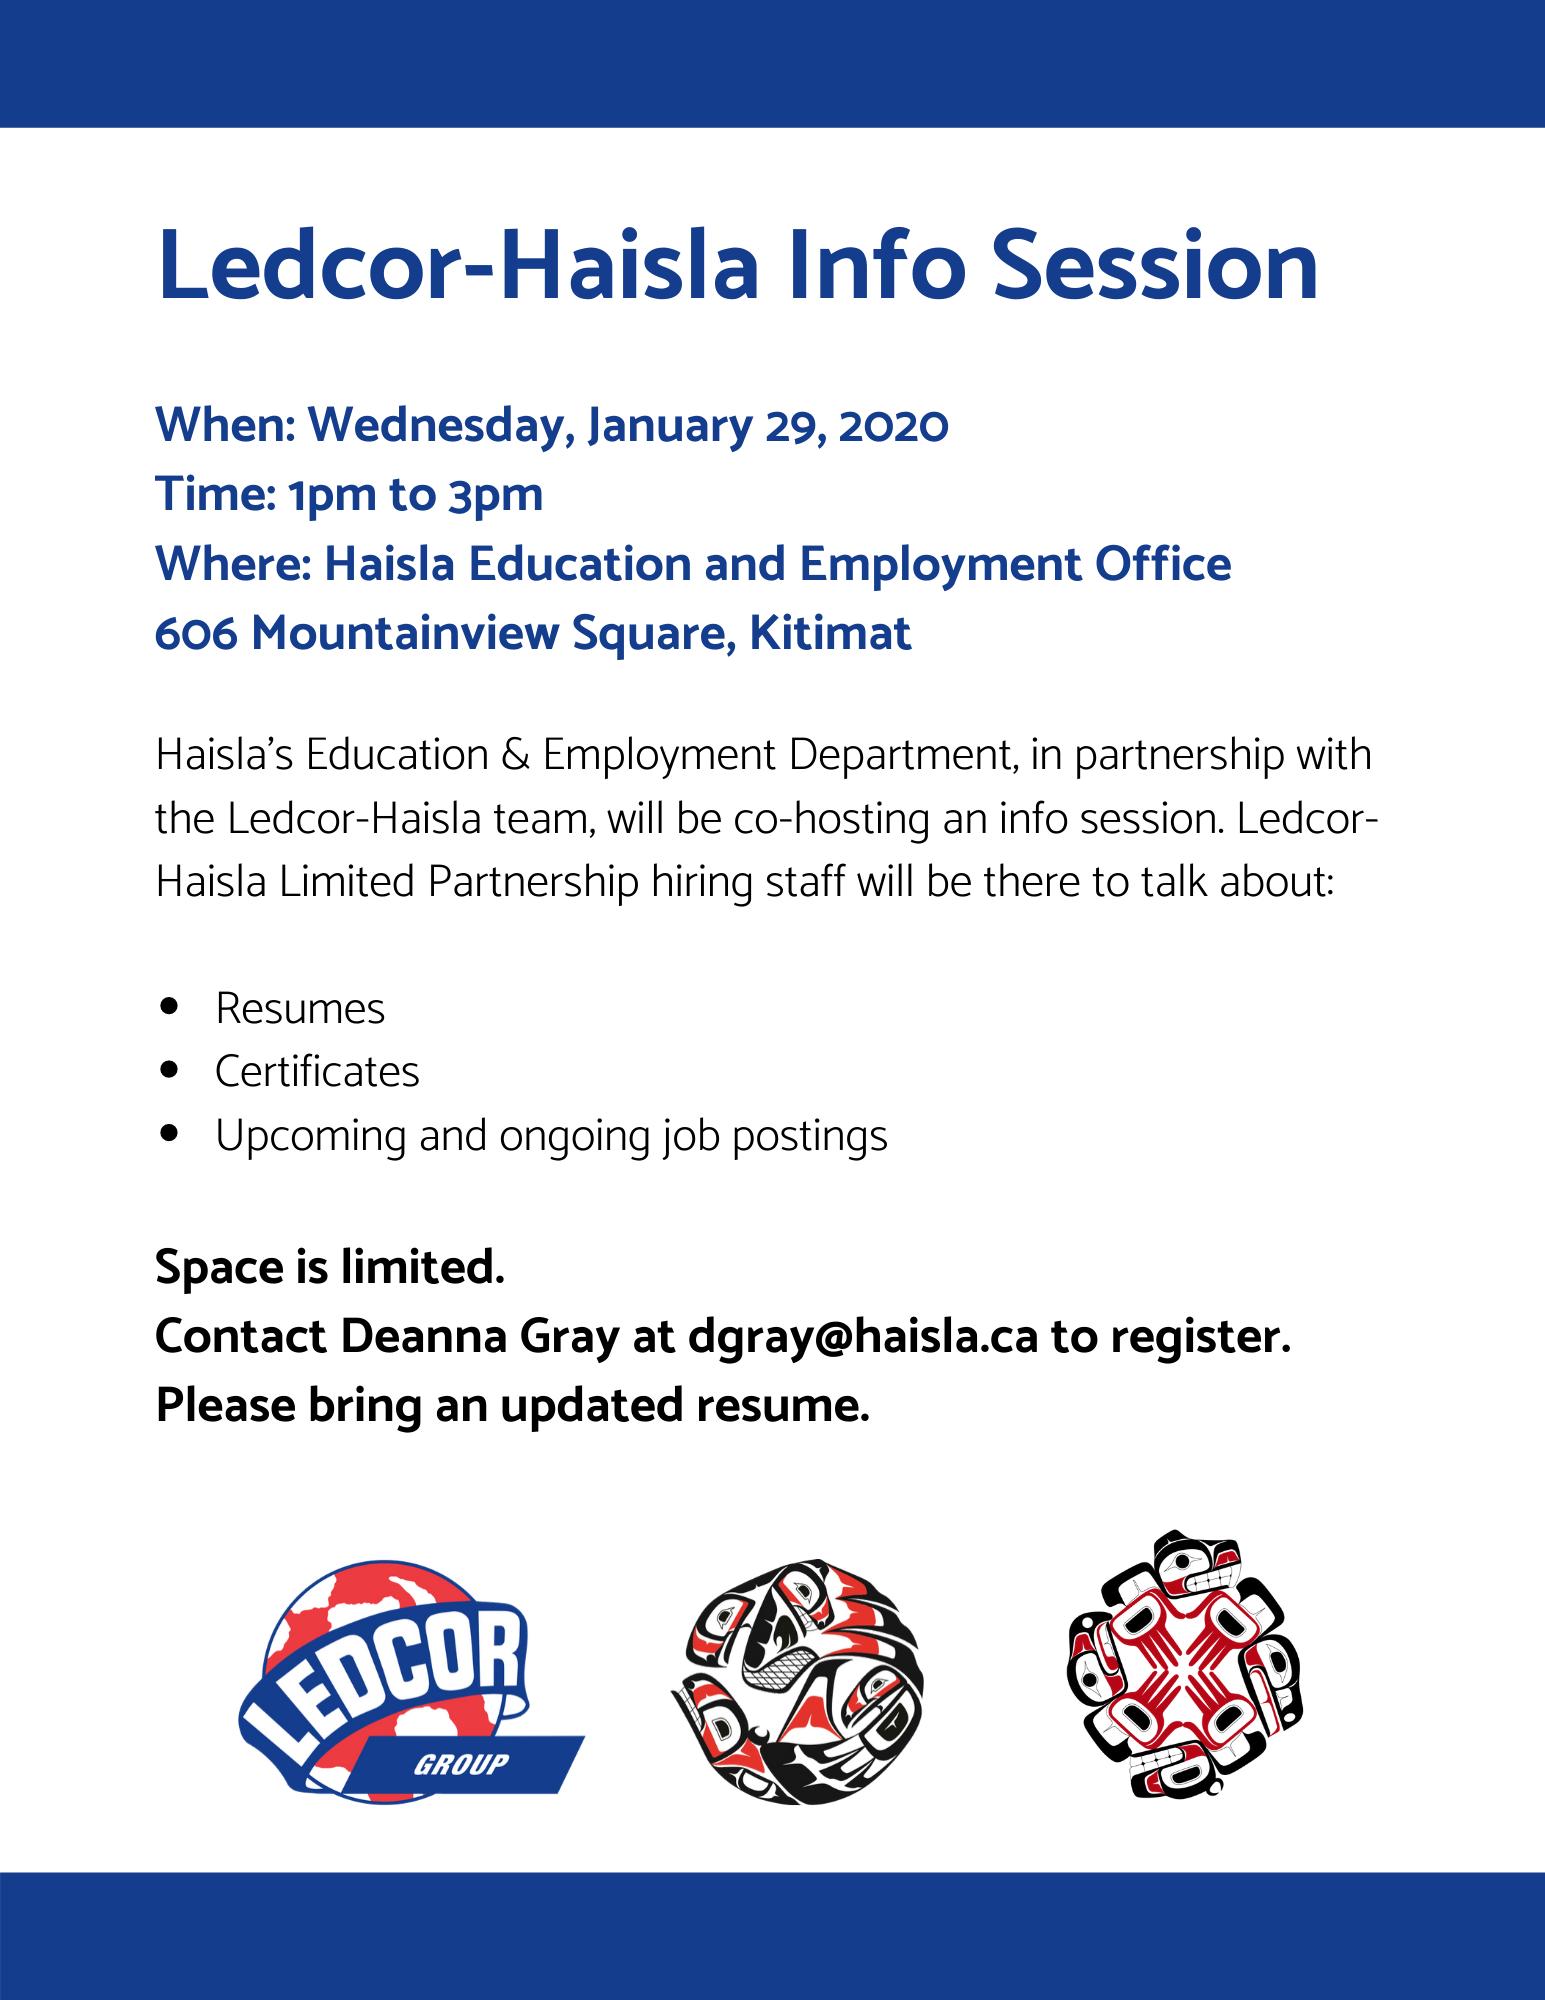 january 29 - ledcor- haisla info session